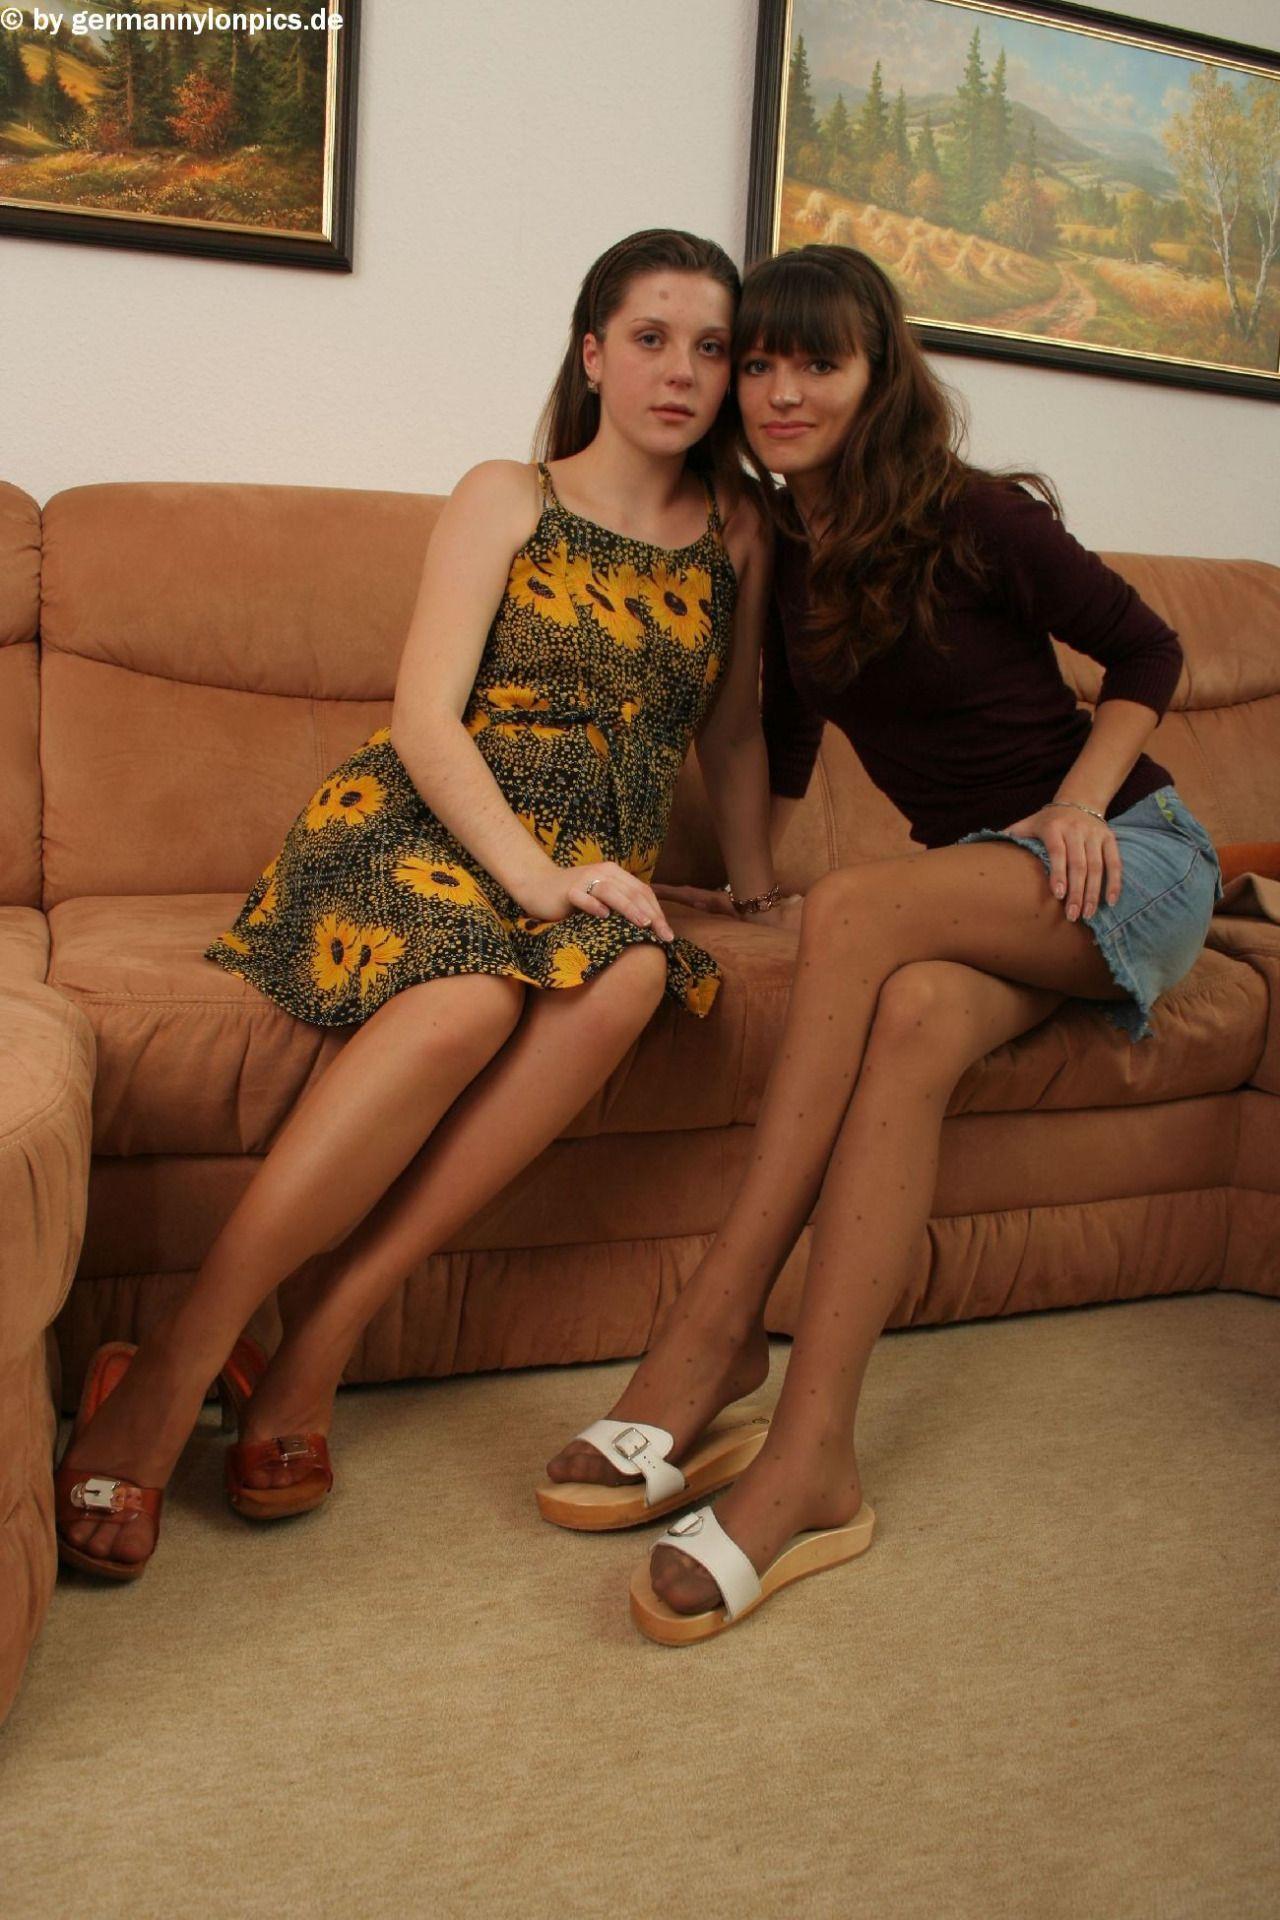 Ladies In Strumpfhosen